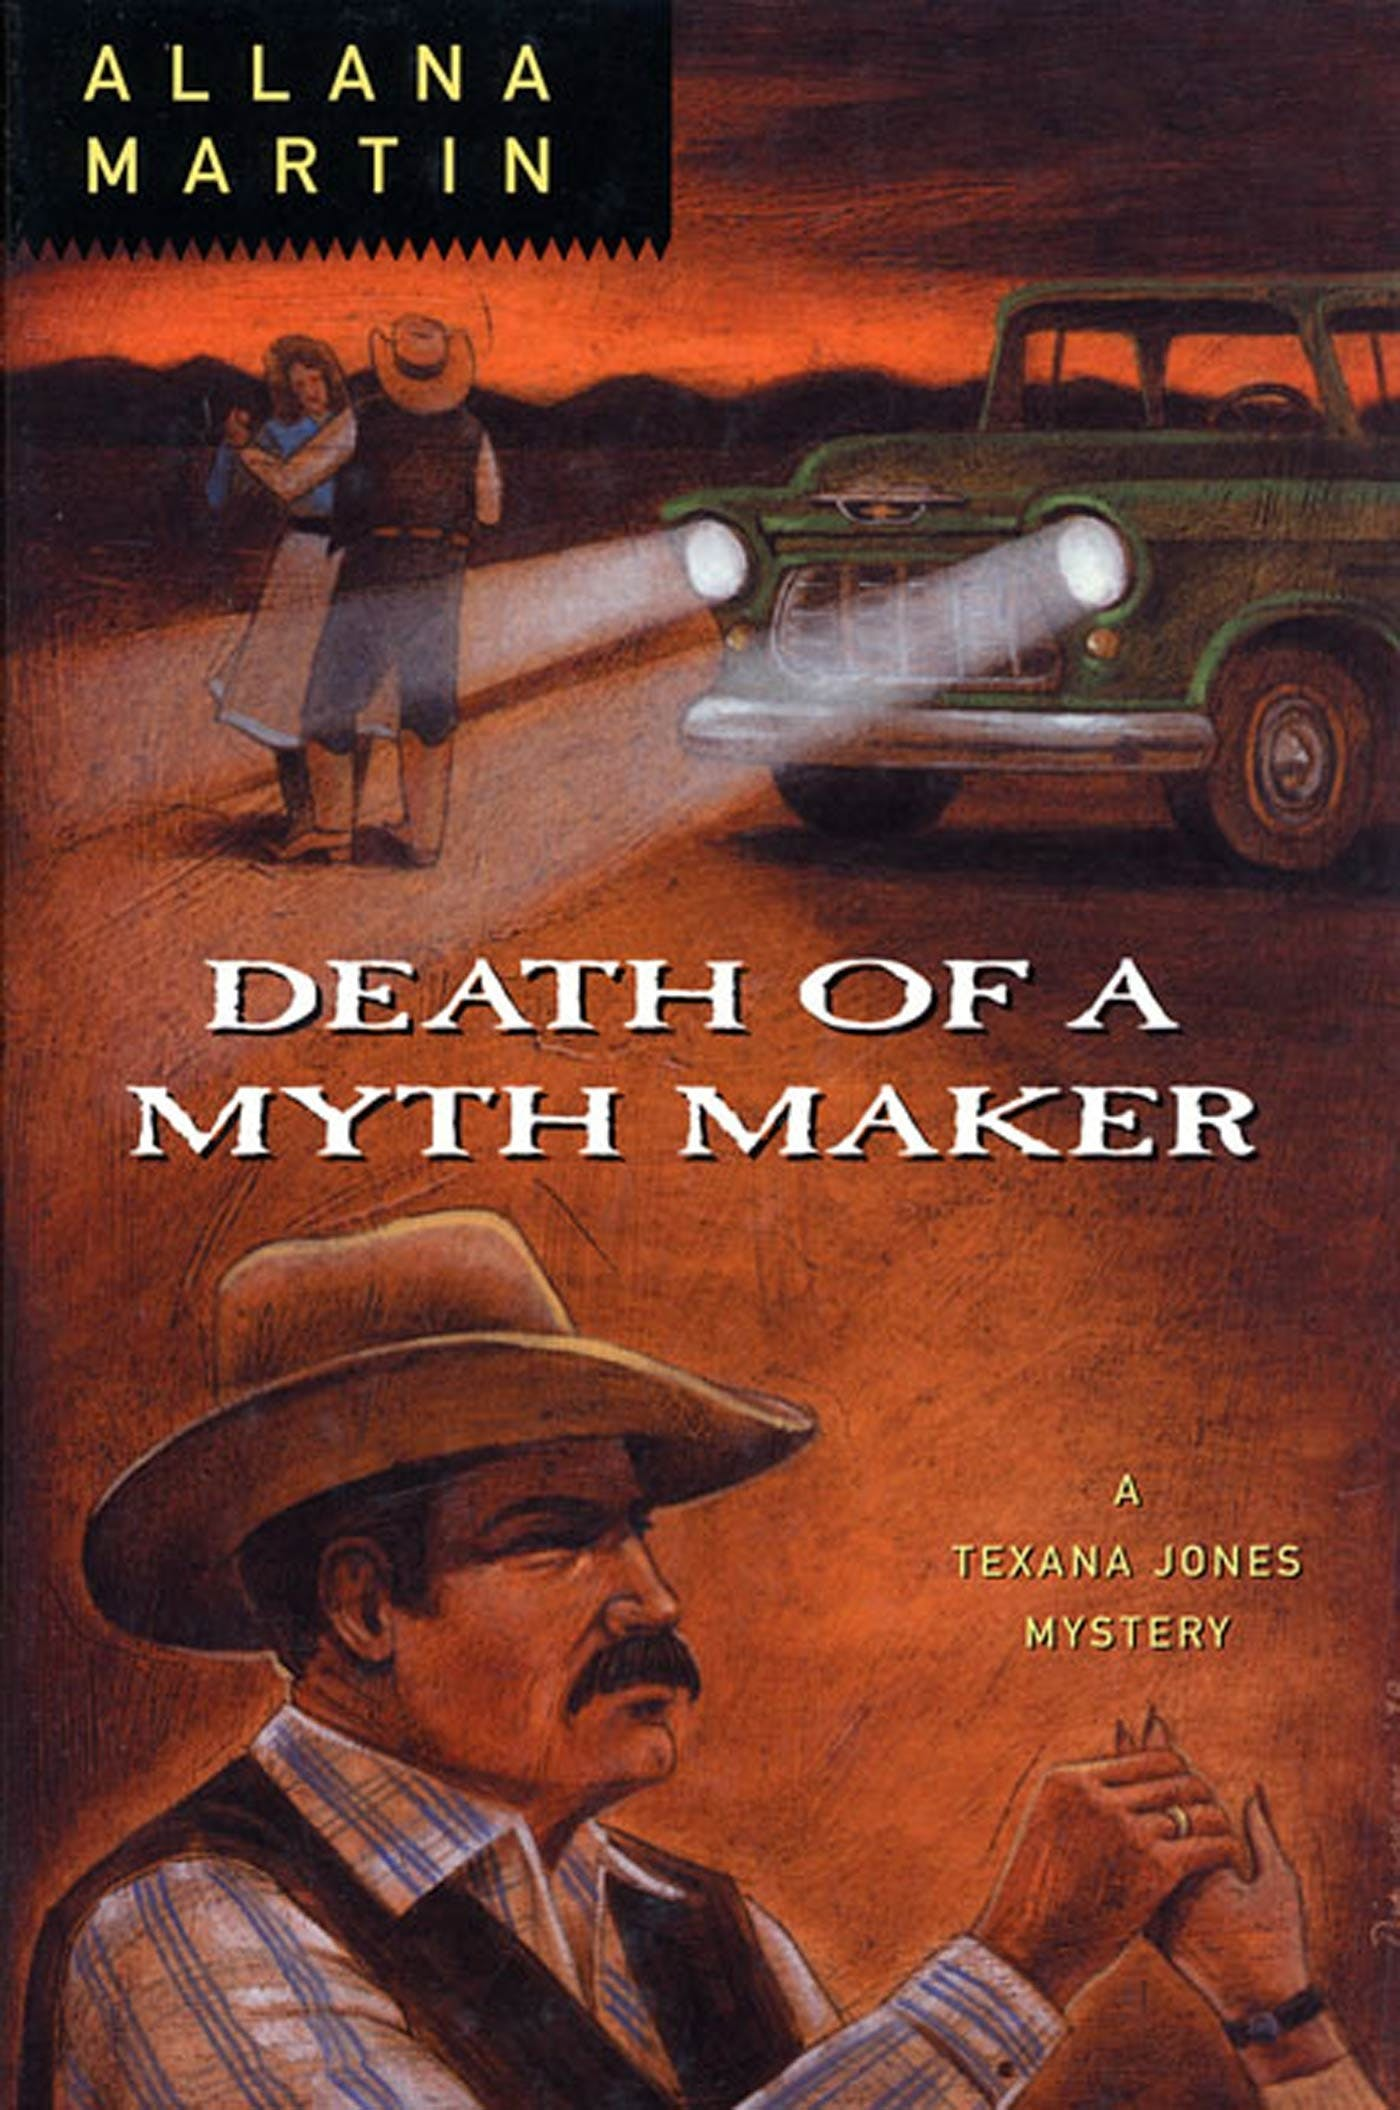 Image of Death of a Myth Maker